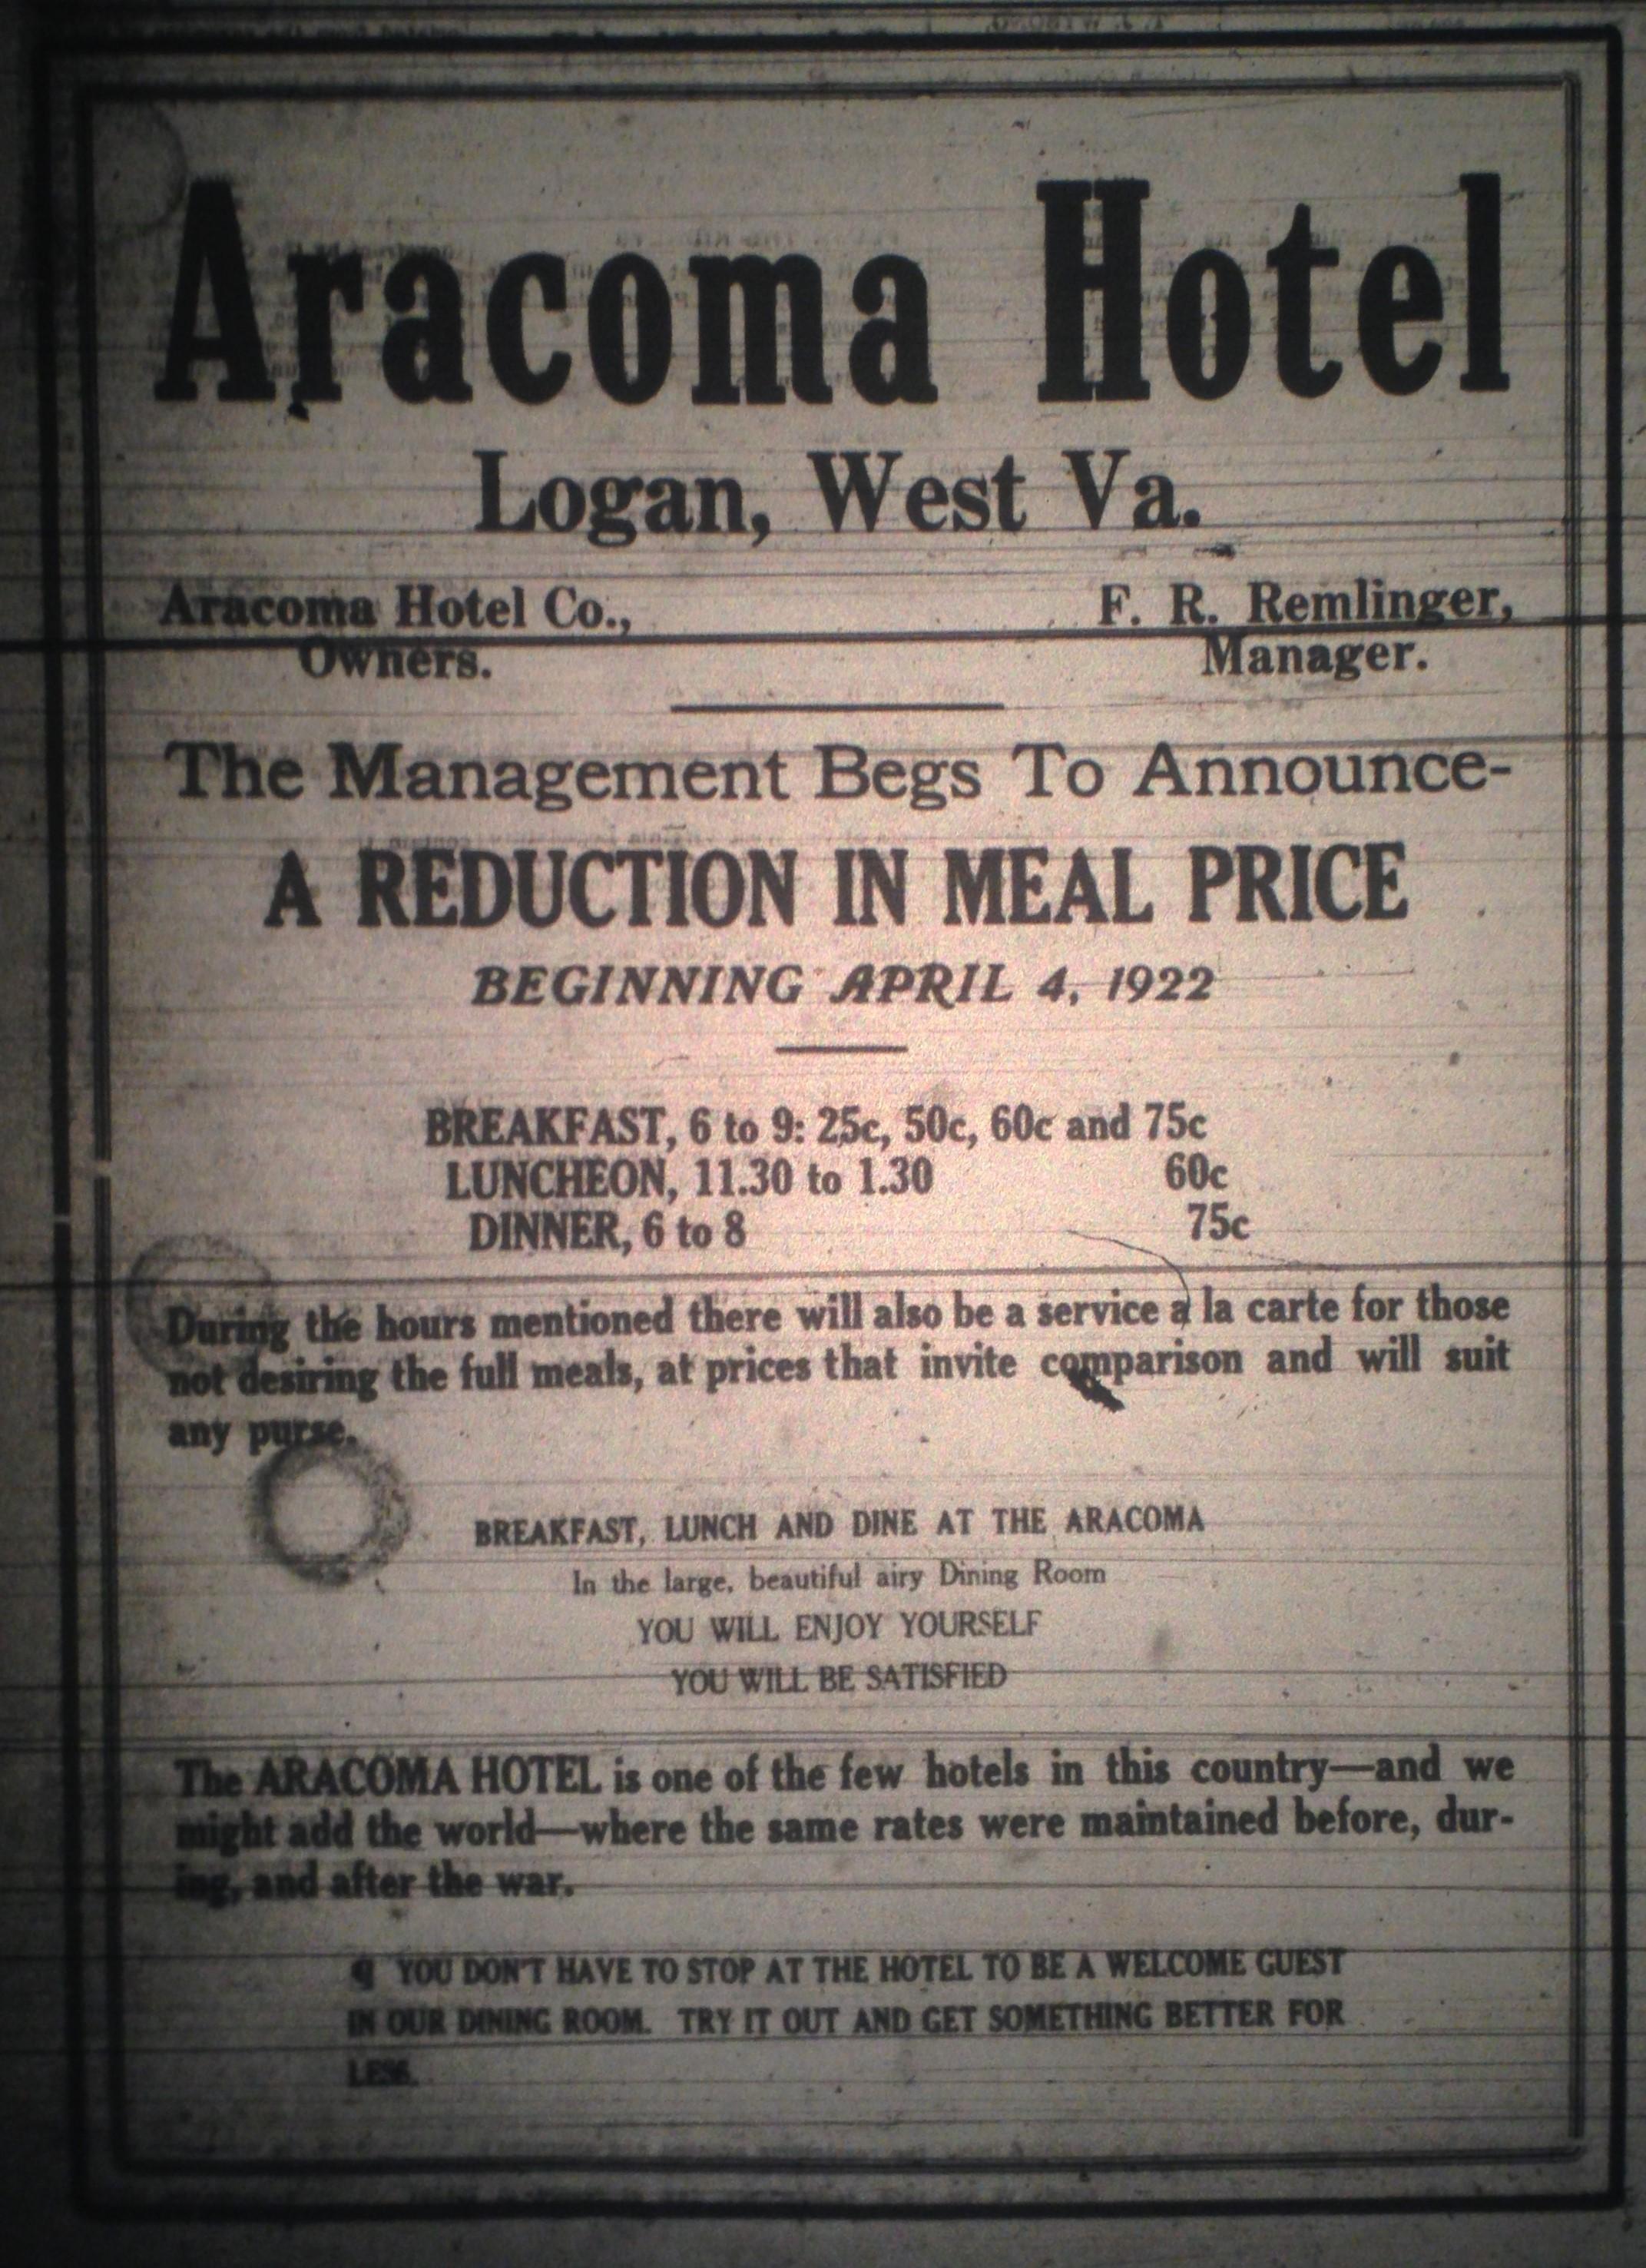 Aracoma Hotel Ad LB 03.31.1922.JPG